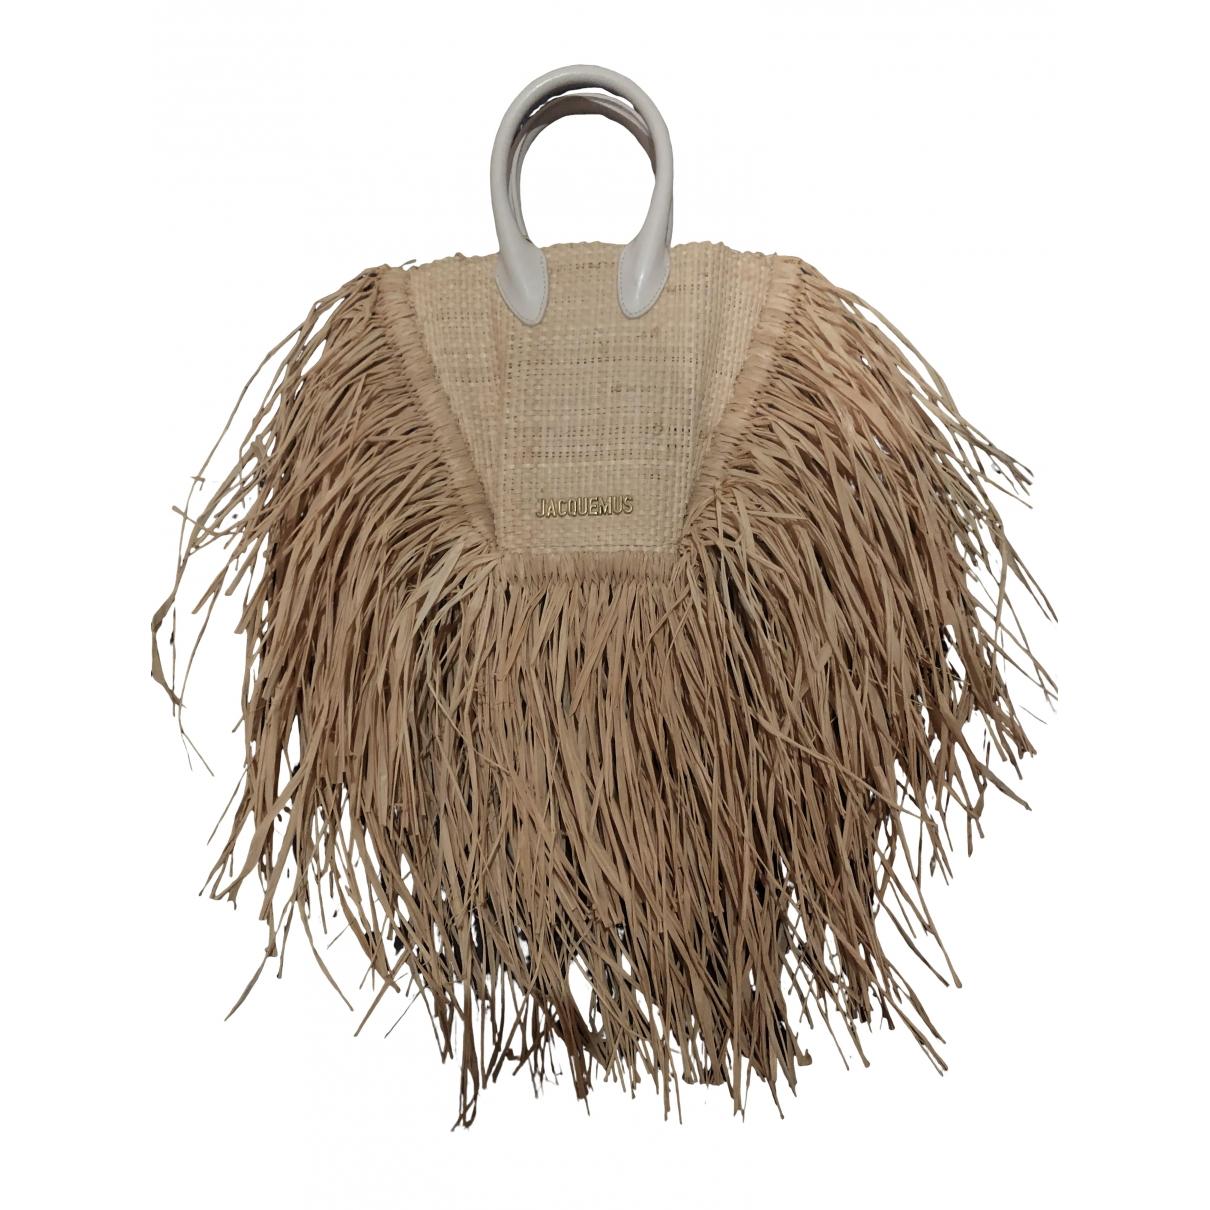 Jacquemus Le Petit Baci Beige Wicker handbag for Women \N